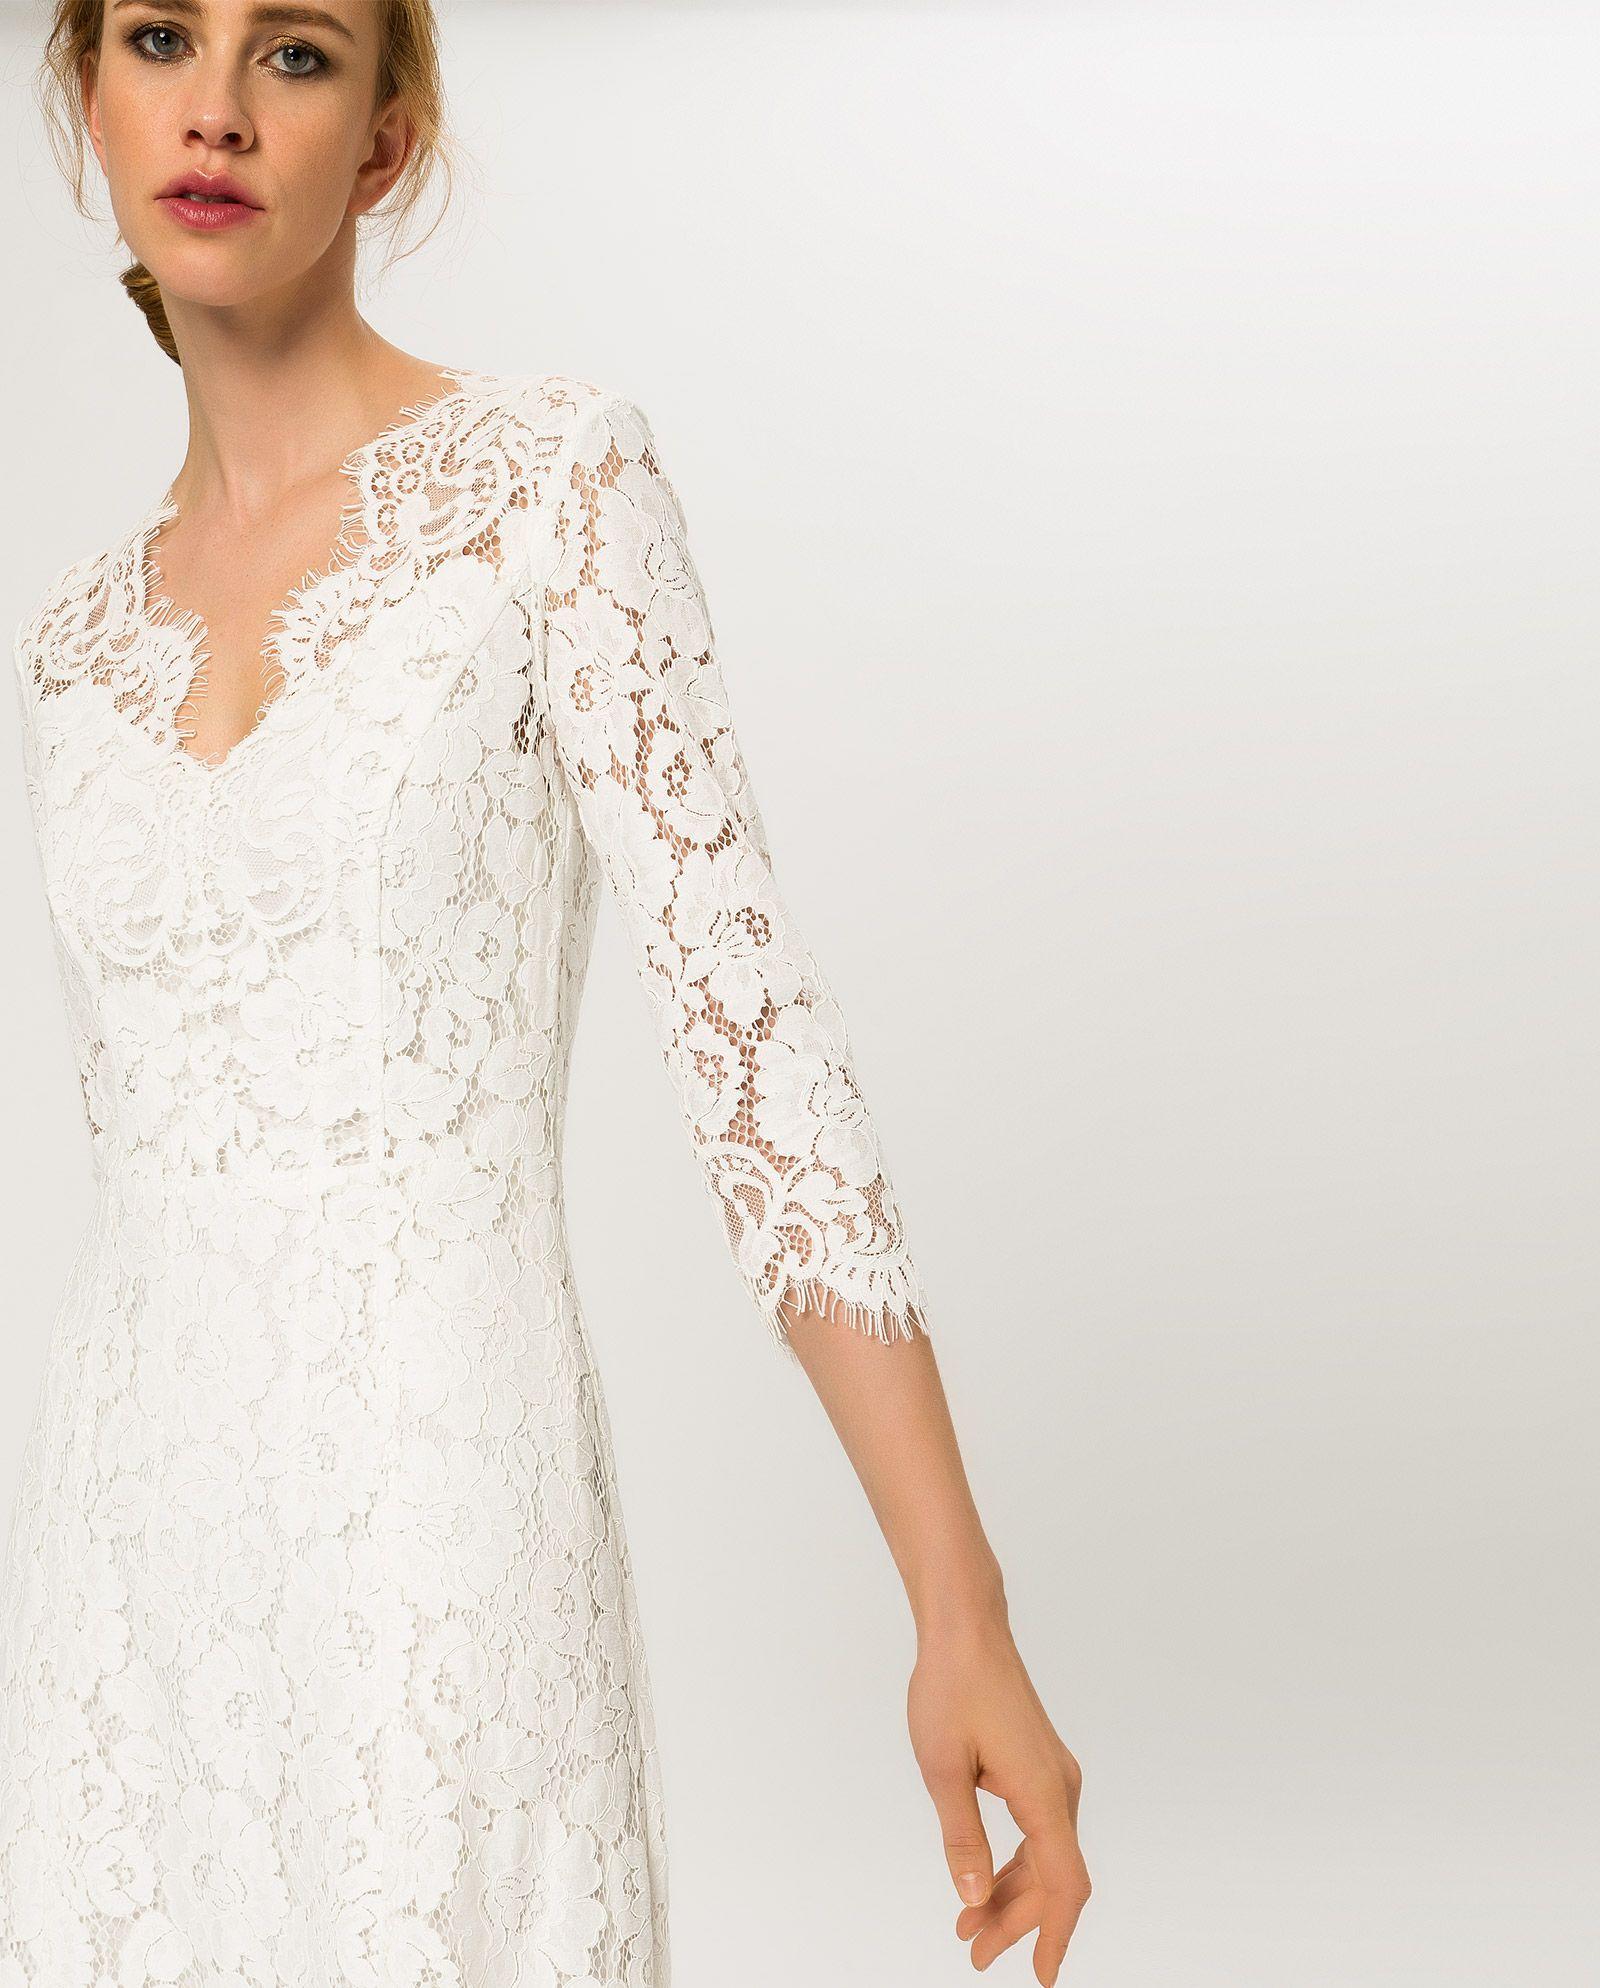 Bodenlanges Spitzenkleid - Cremeweiß - IVY & OAK  Lace dress